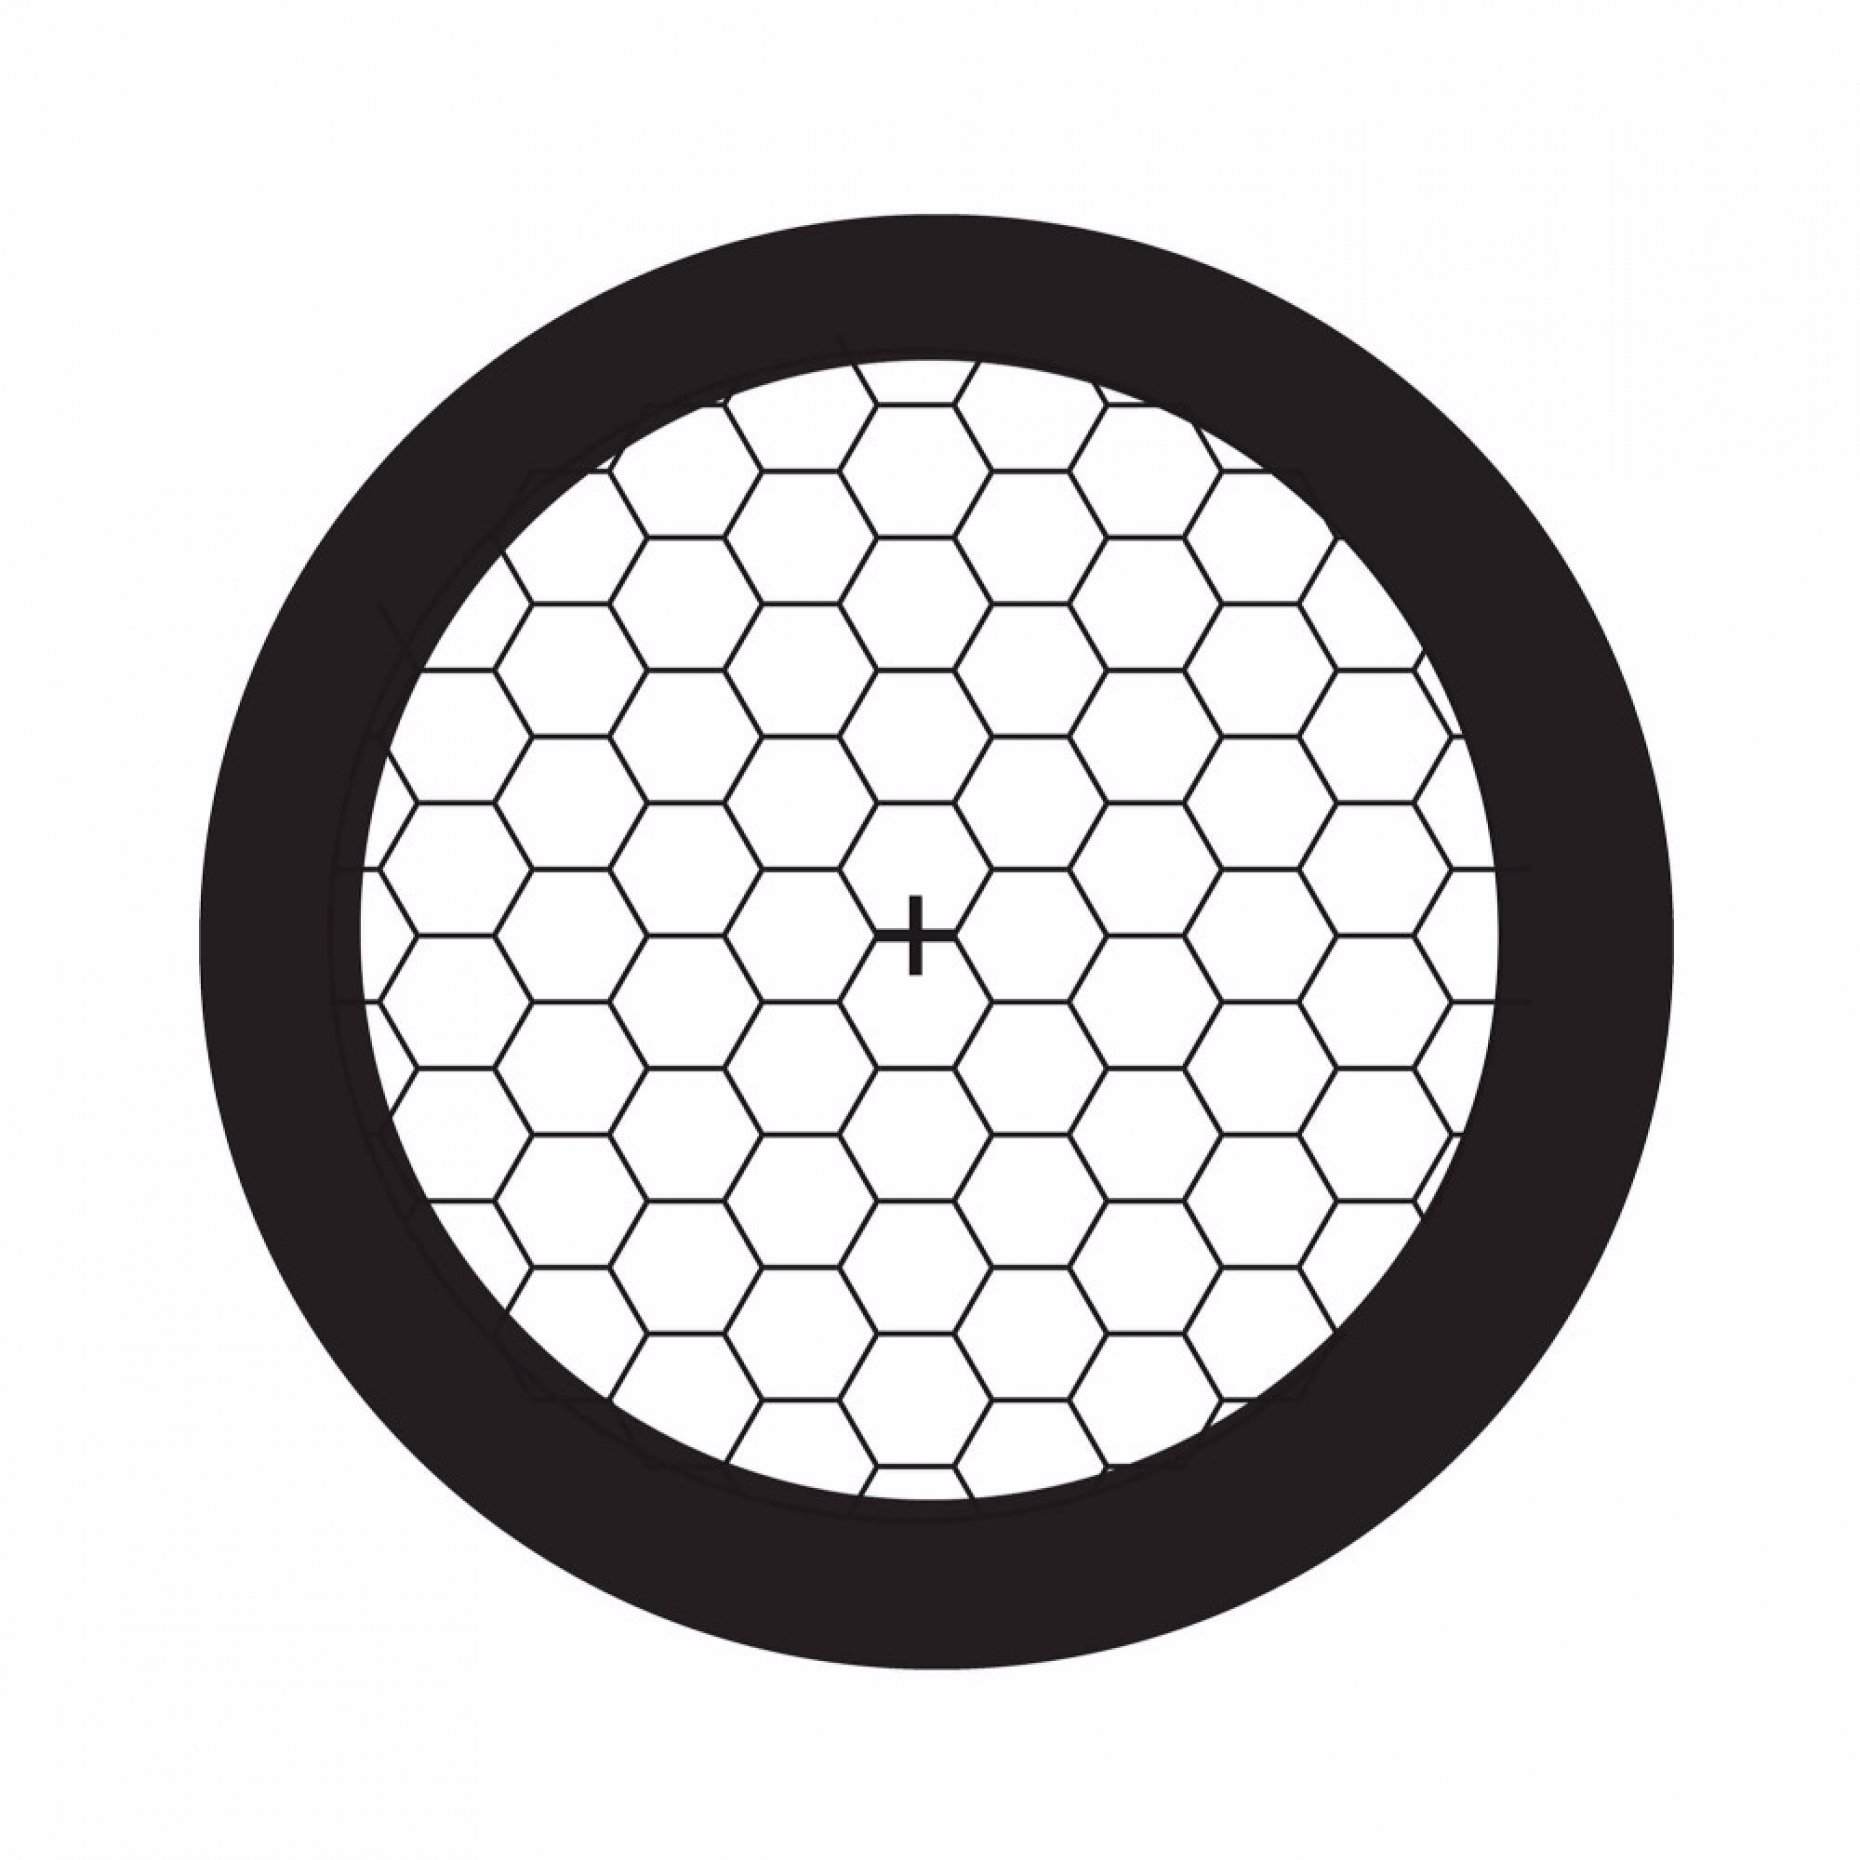 90 Mesh Hexagonal Grid